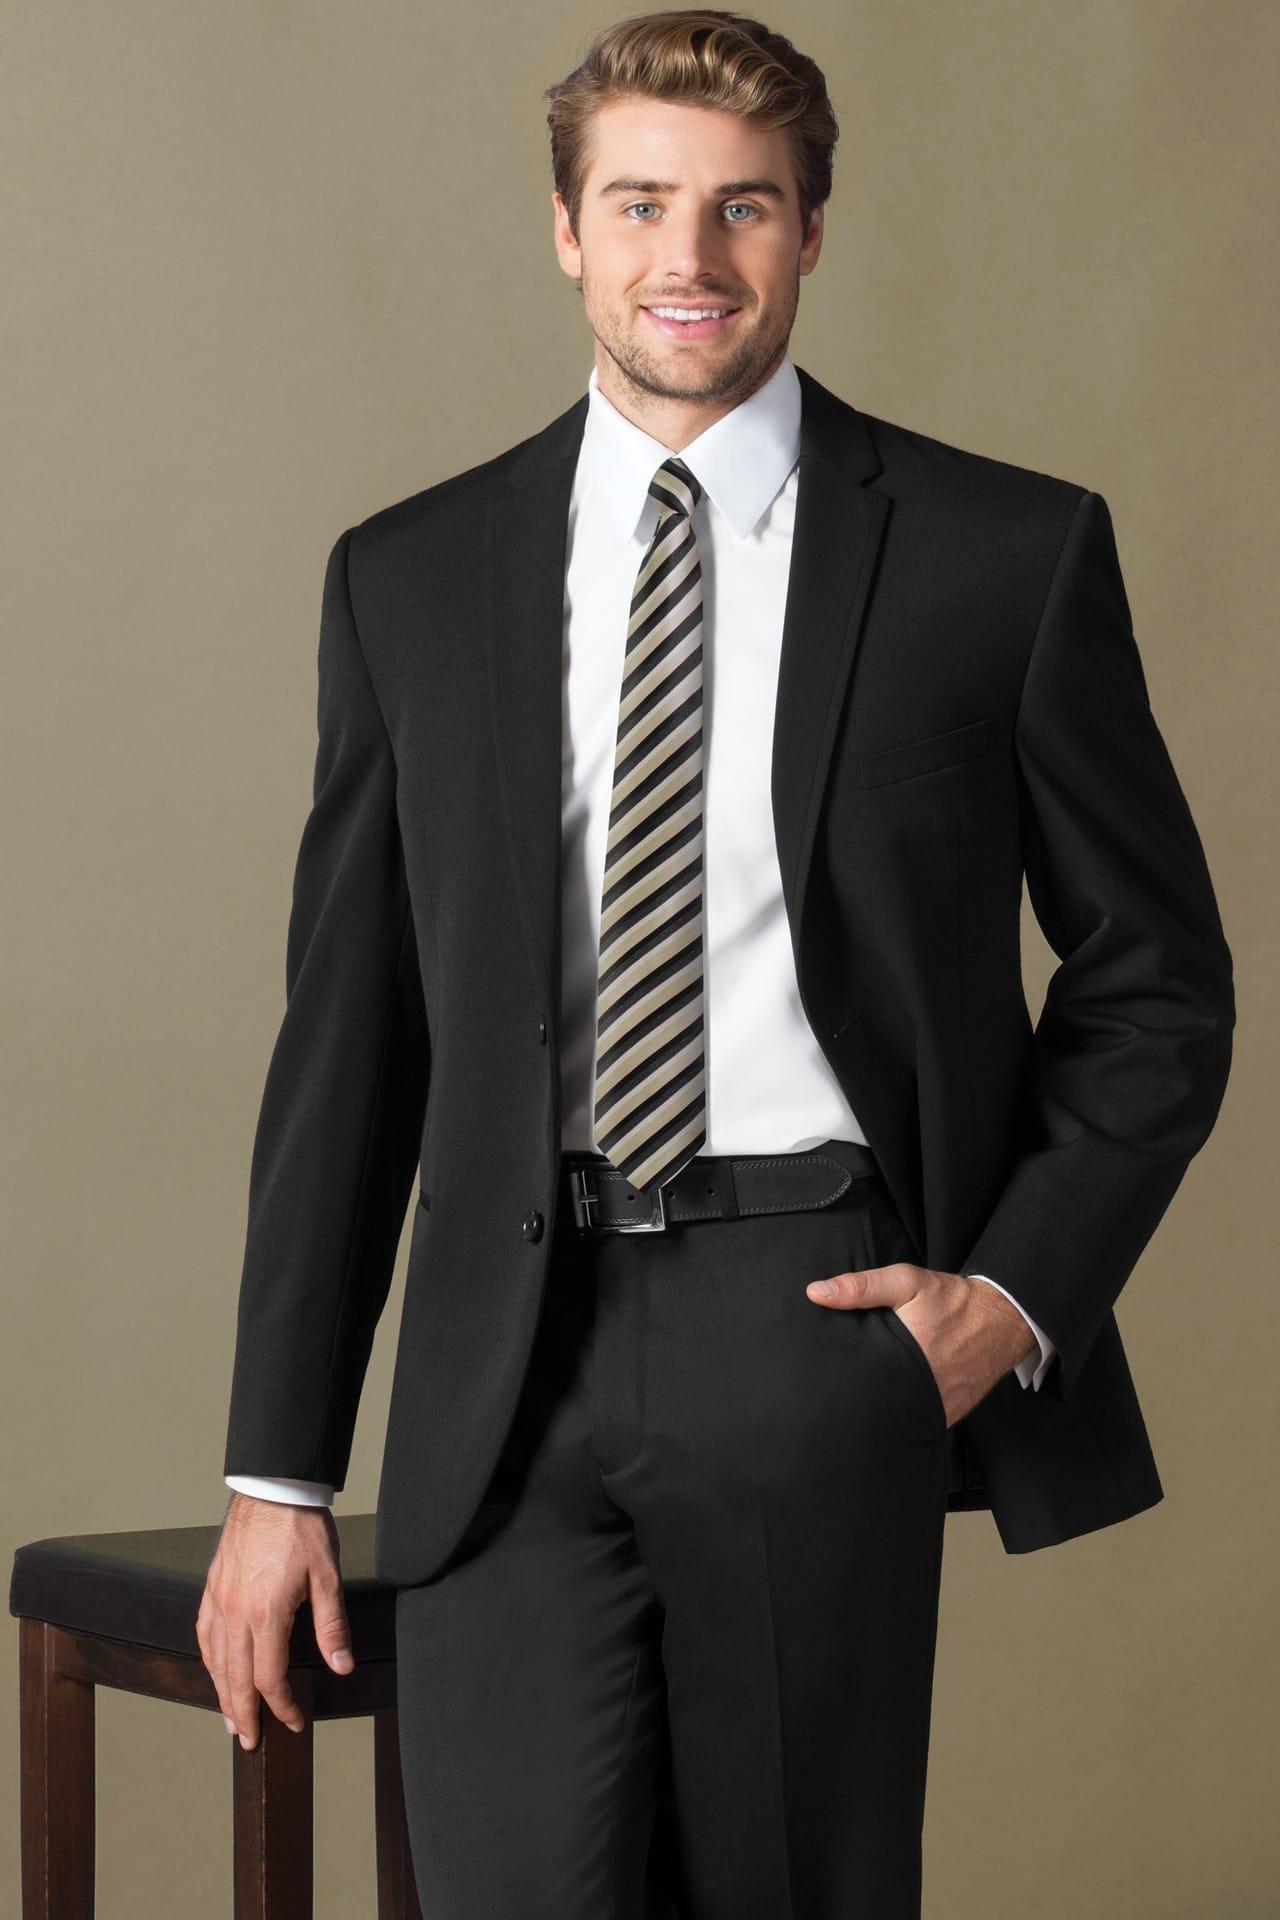 Michael Kors Sterling Wedding Suit Slim Fit Suit | Jim's Formal ...